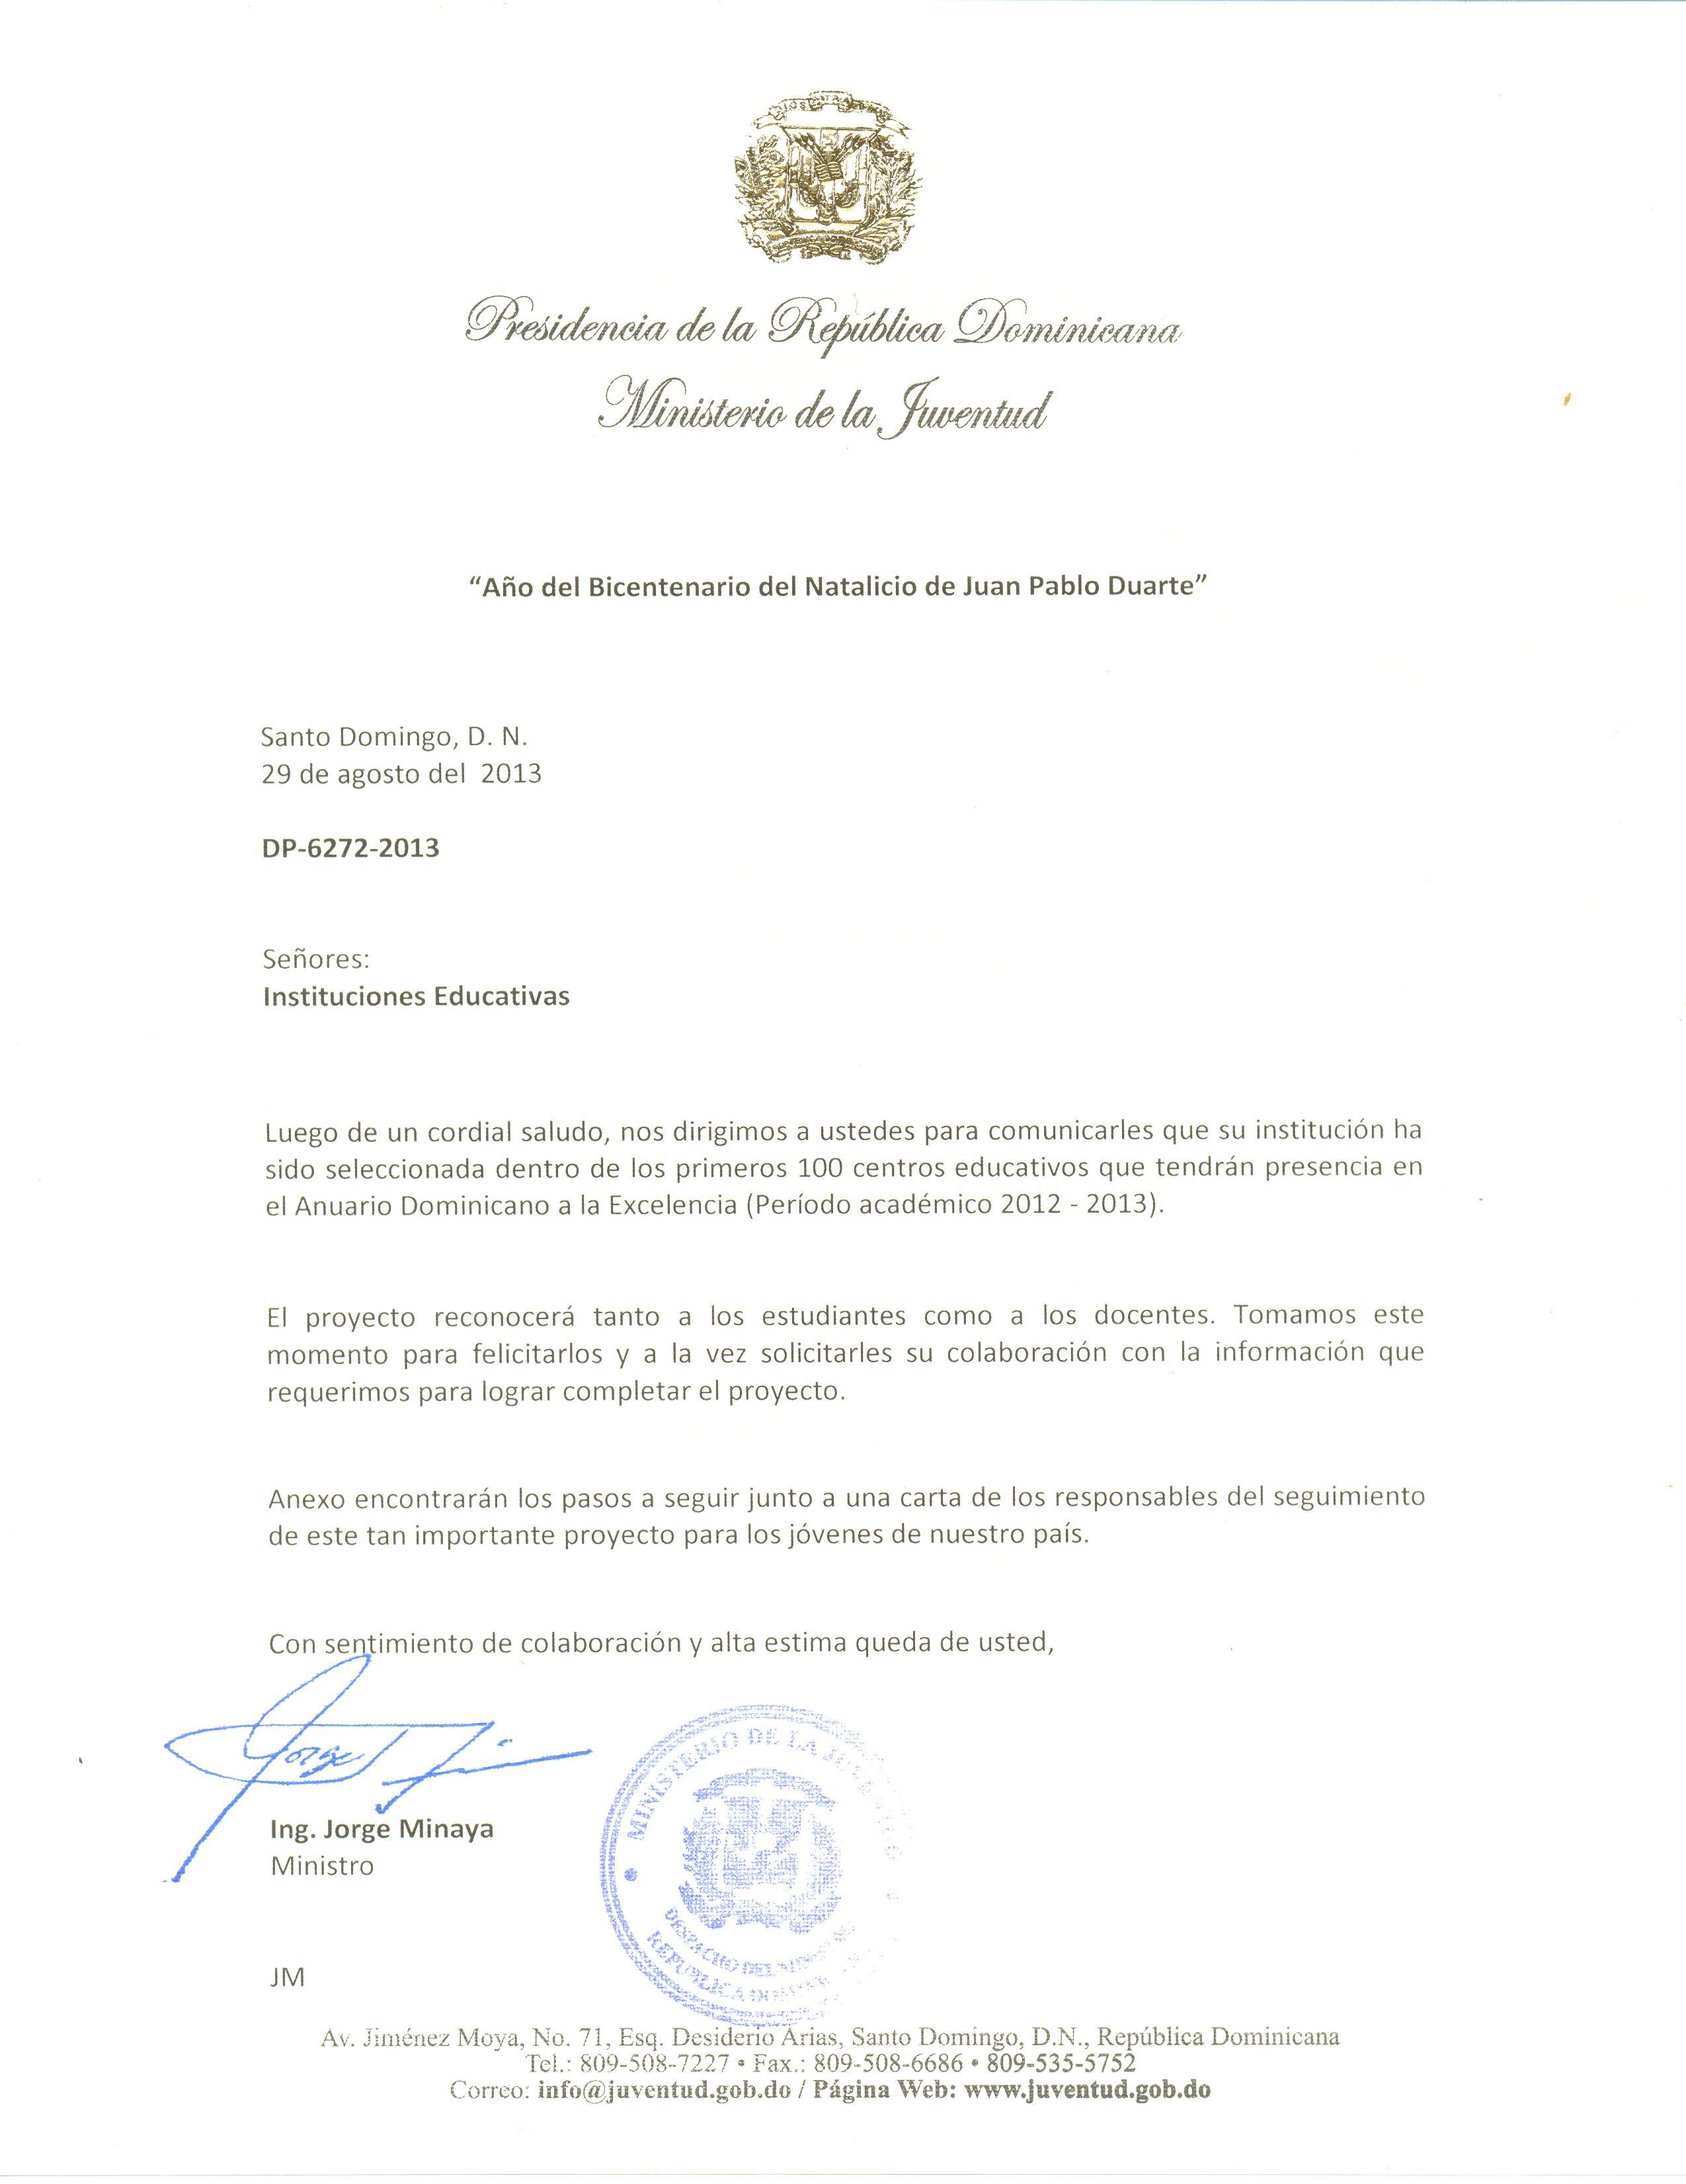 Carta ministerio educacion 001 the teaching experiment for Ministerio educacion exterior